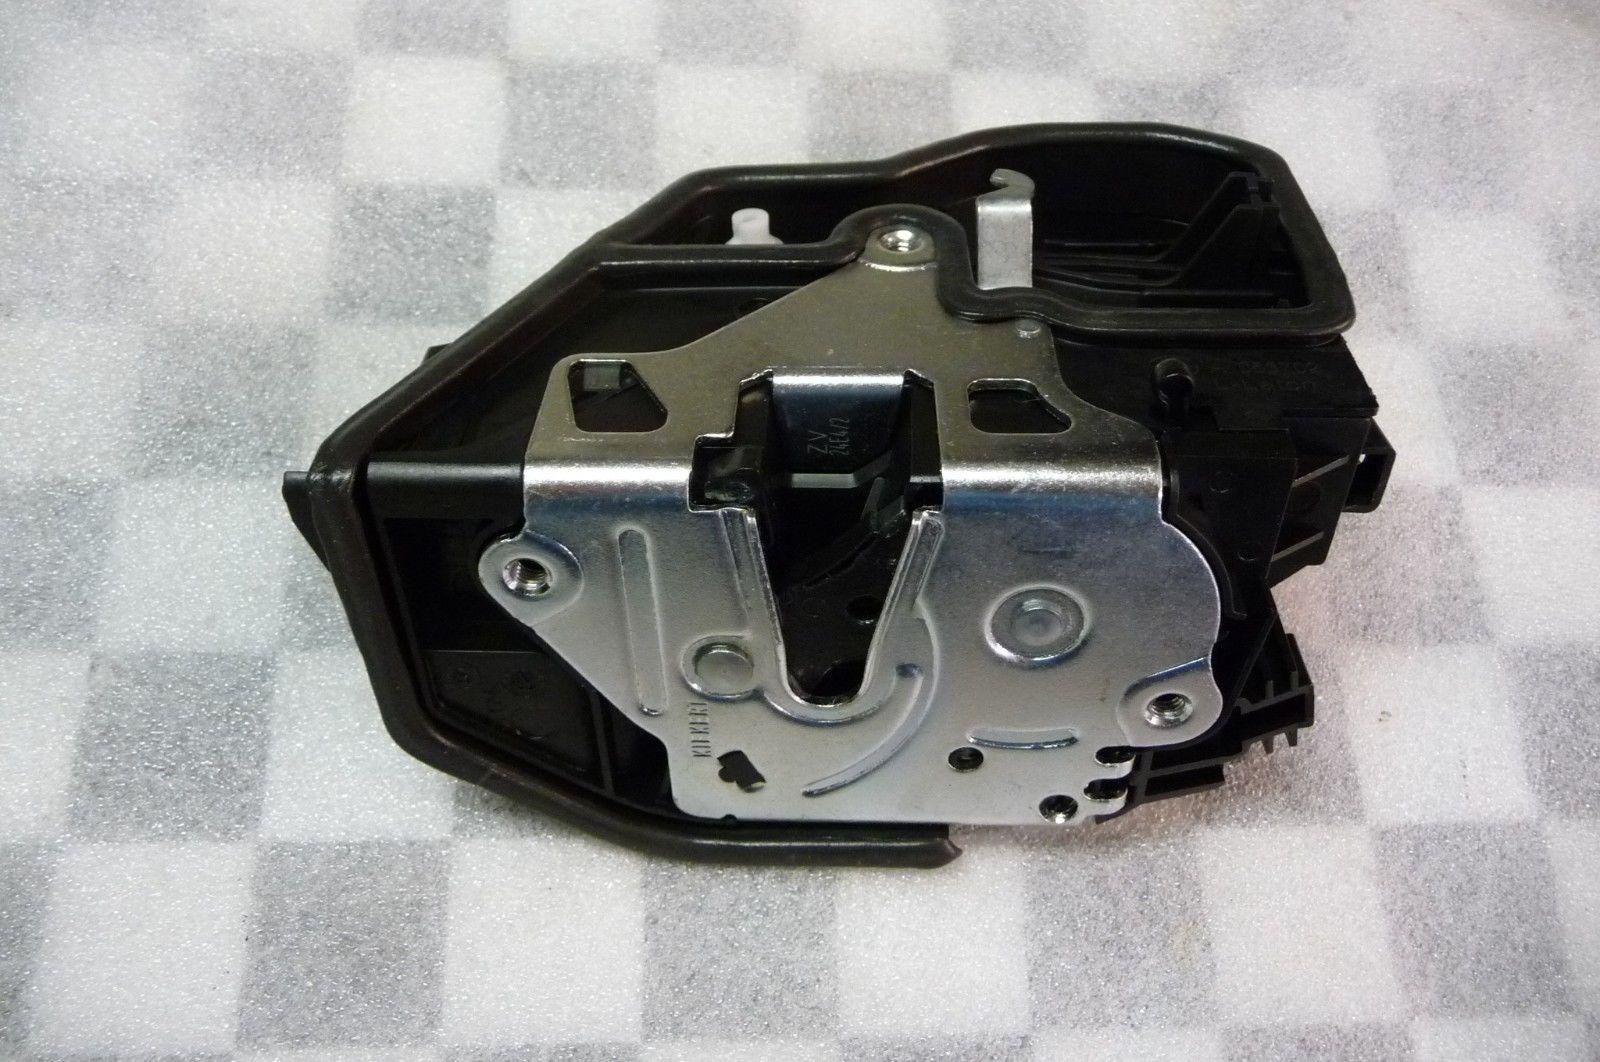 BMW 3 4 5 6 7 X1 X3 X5 X6 Rear Left Door Closing System Latch Lock 51227202147